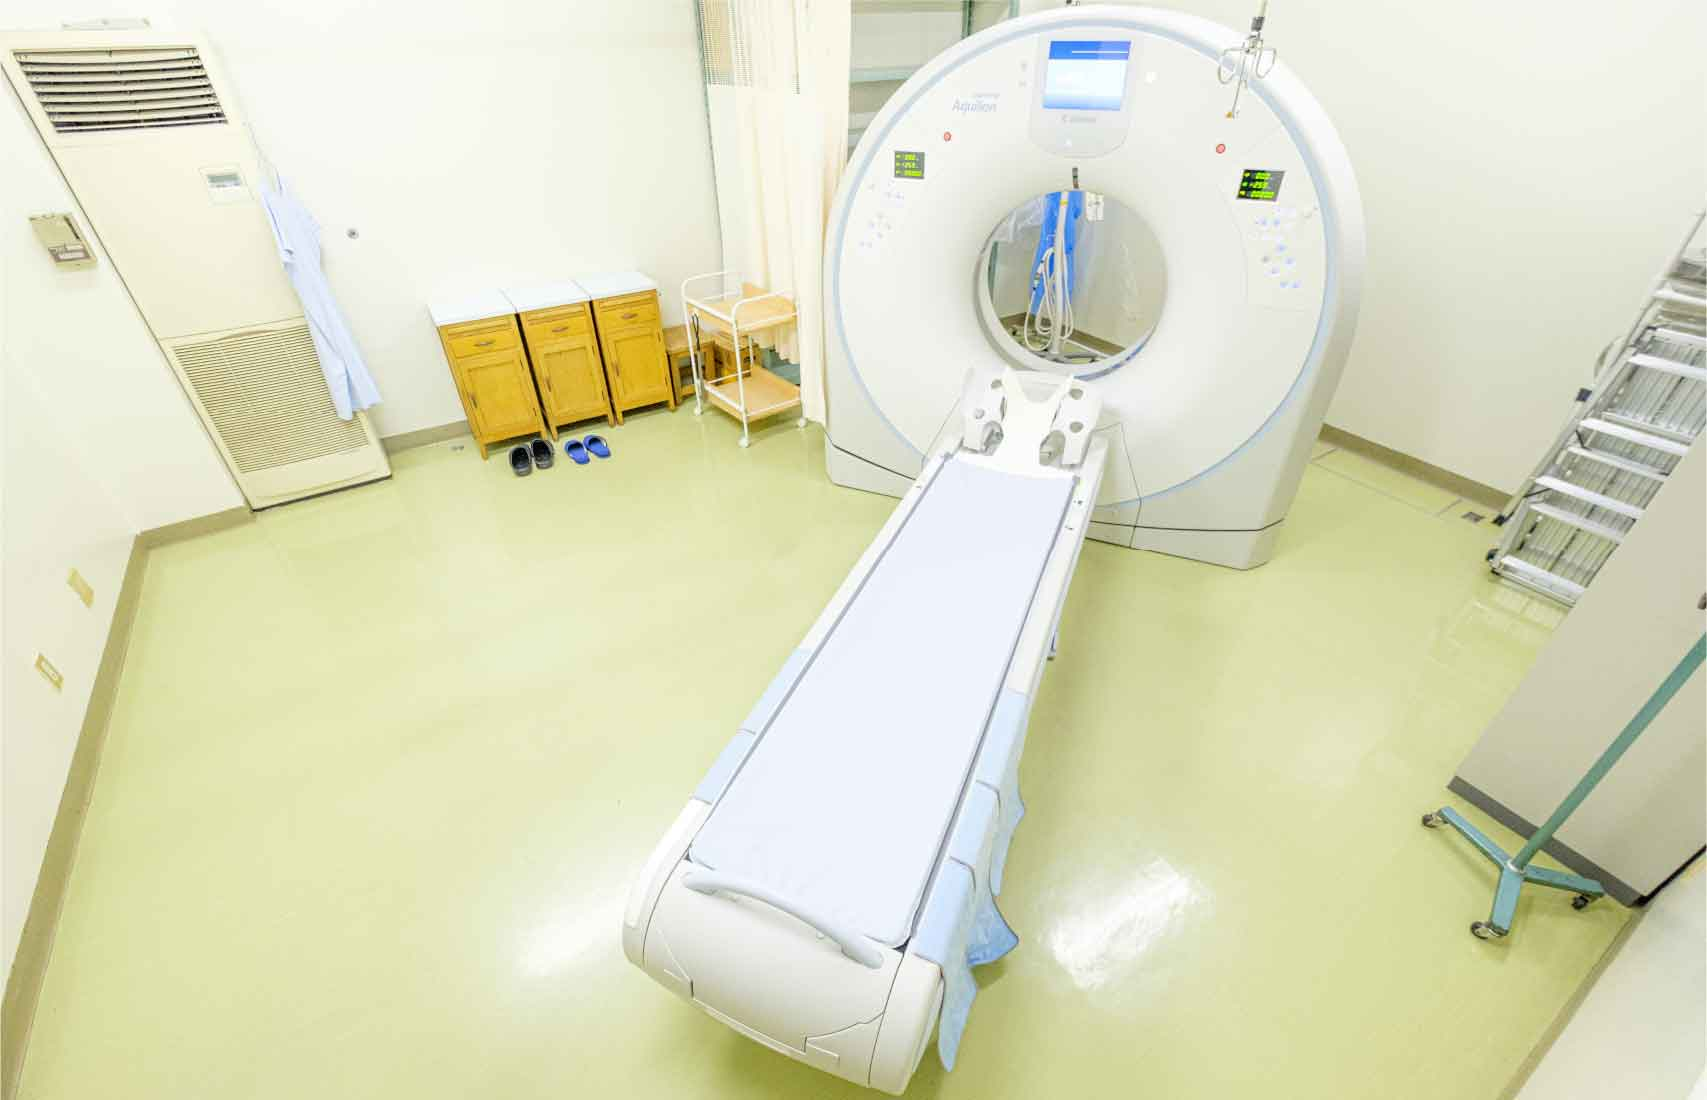 CT(コンピュータ断層撮影装置)検査(心臓を除く体全体)